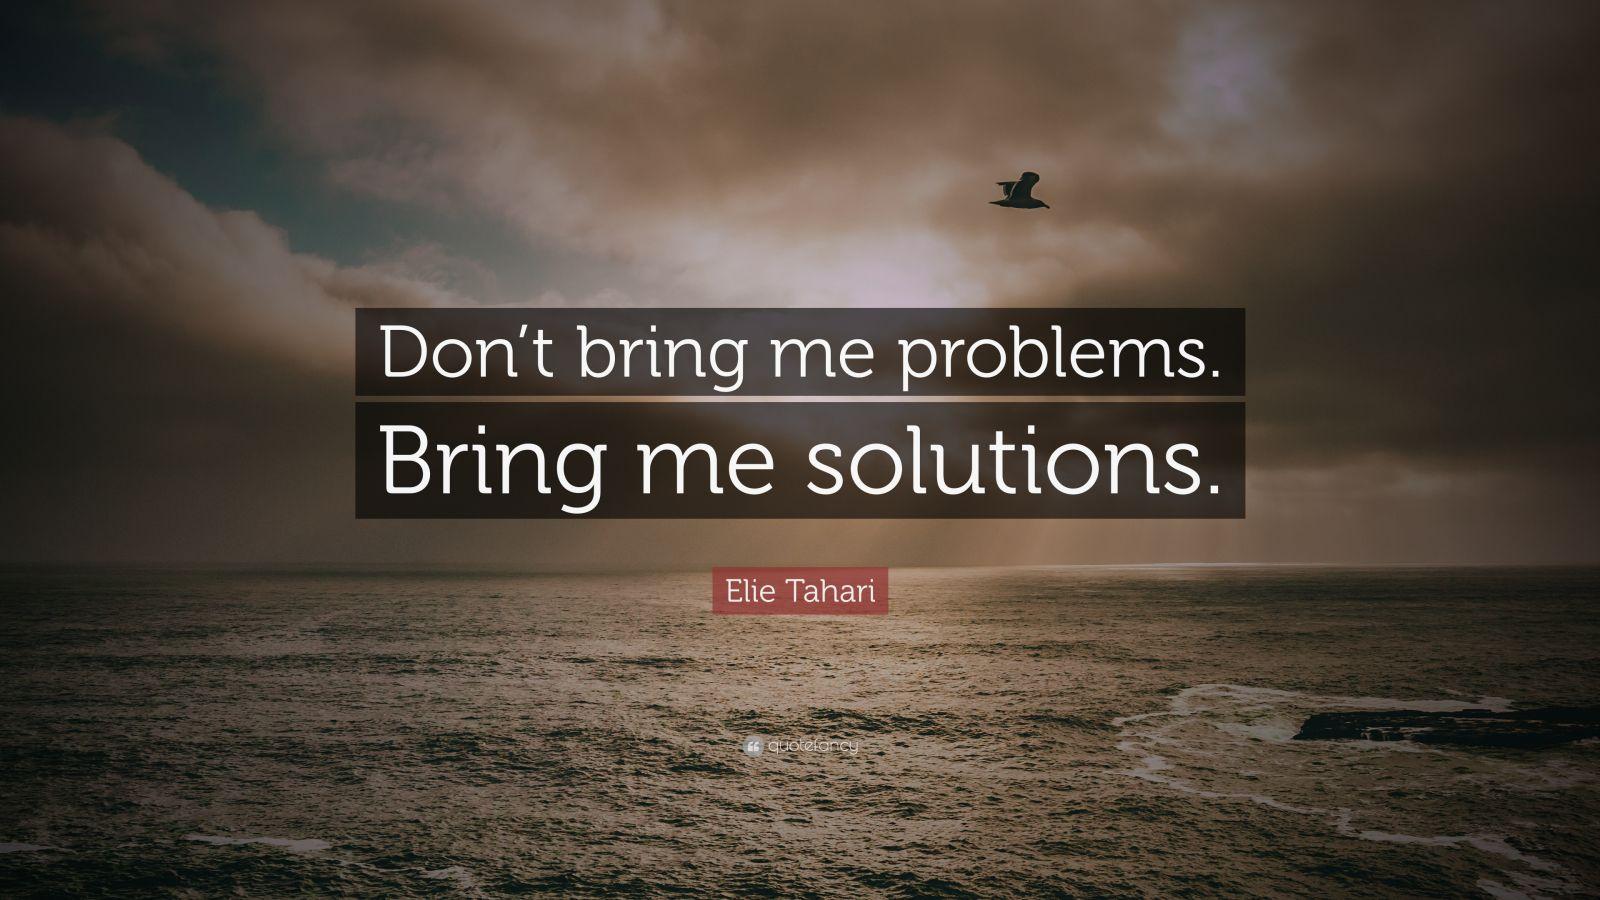 Wallpaper Motivational Quotes 42 Elie Tahari Quote Don T Bring Me Problems Bring Me